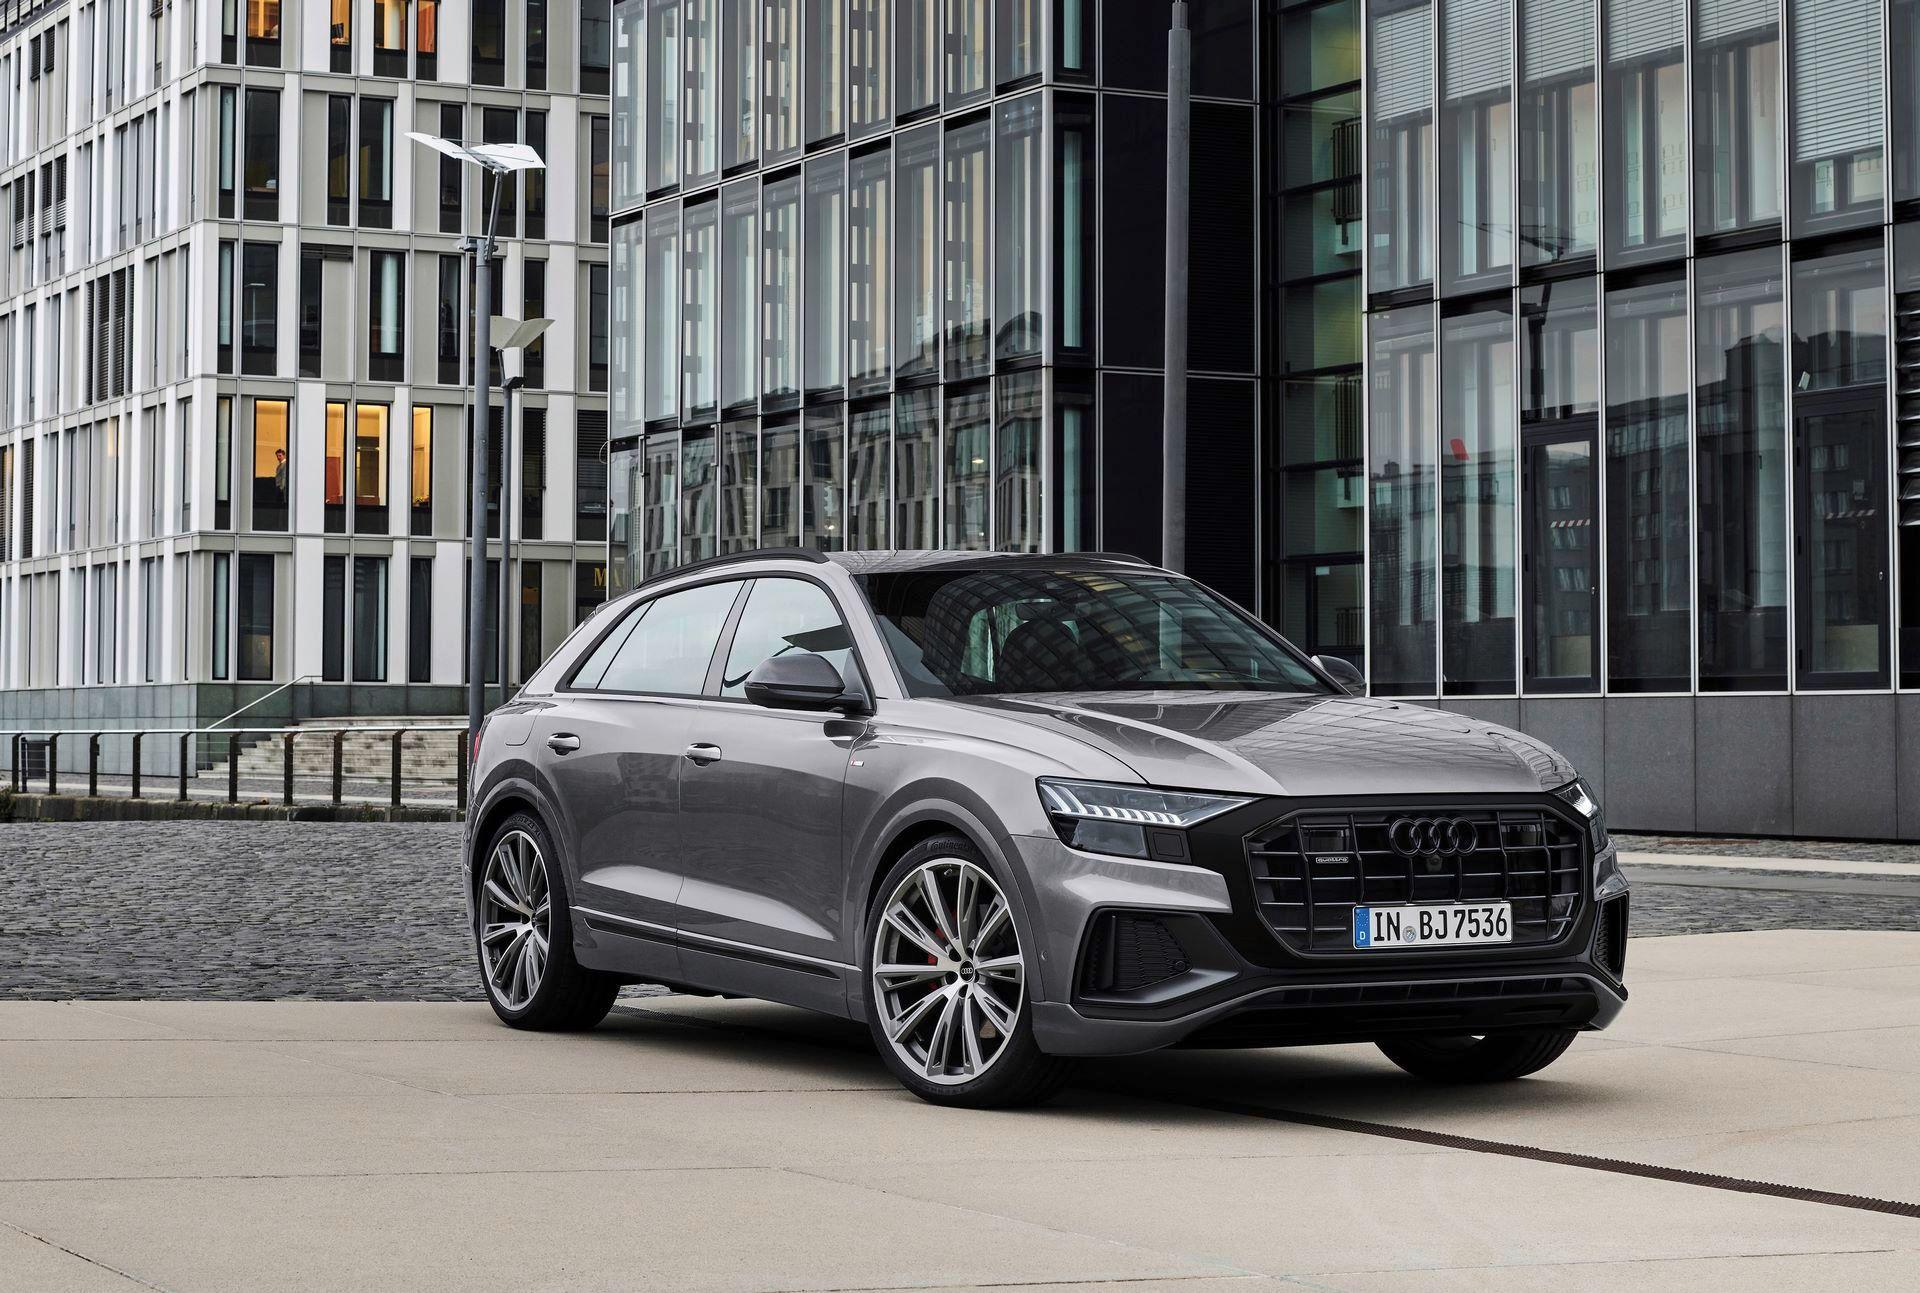 Audi-A4-A5-Q7-Q8-Competition-And-Competition-Plus-Trims-7